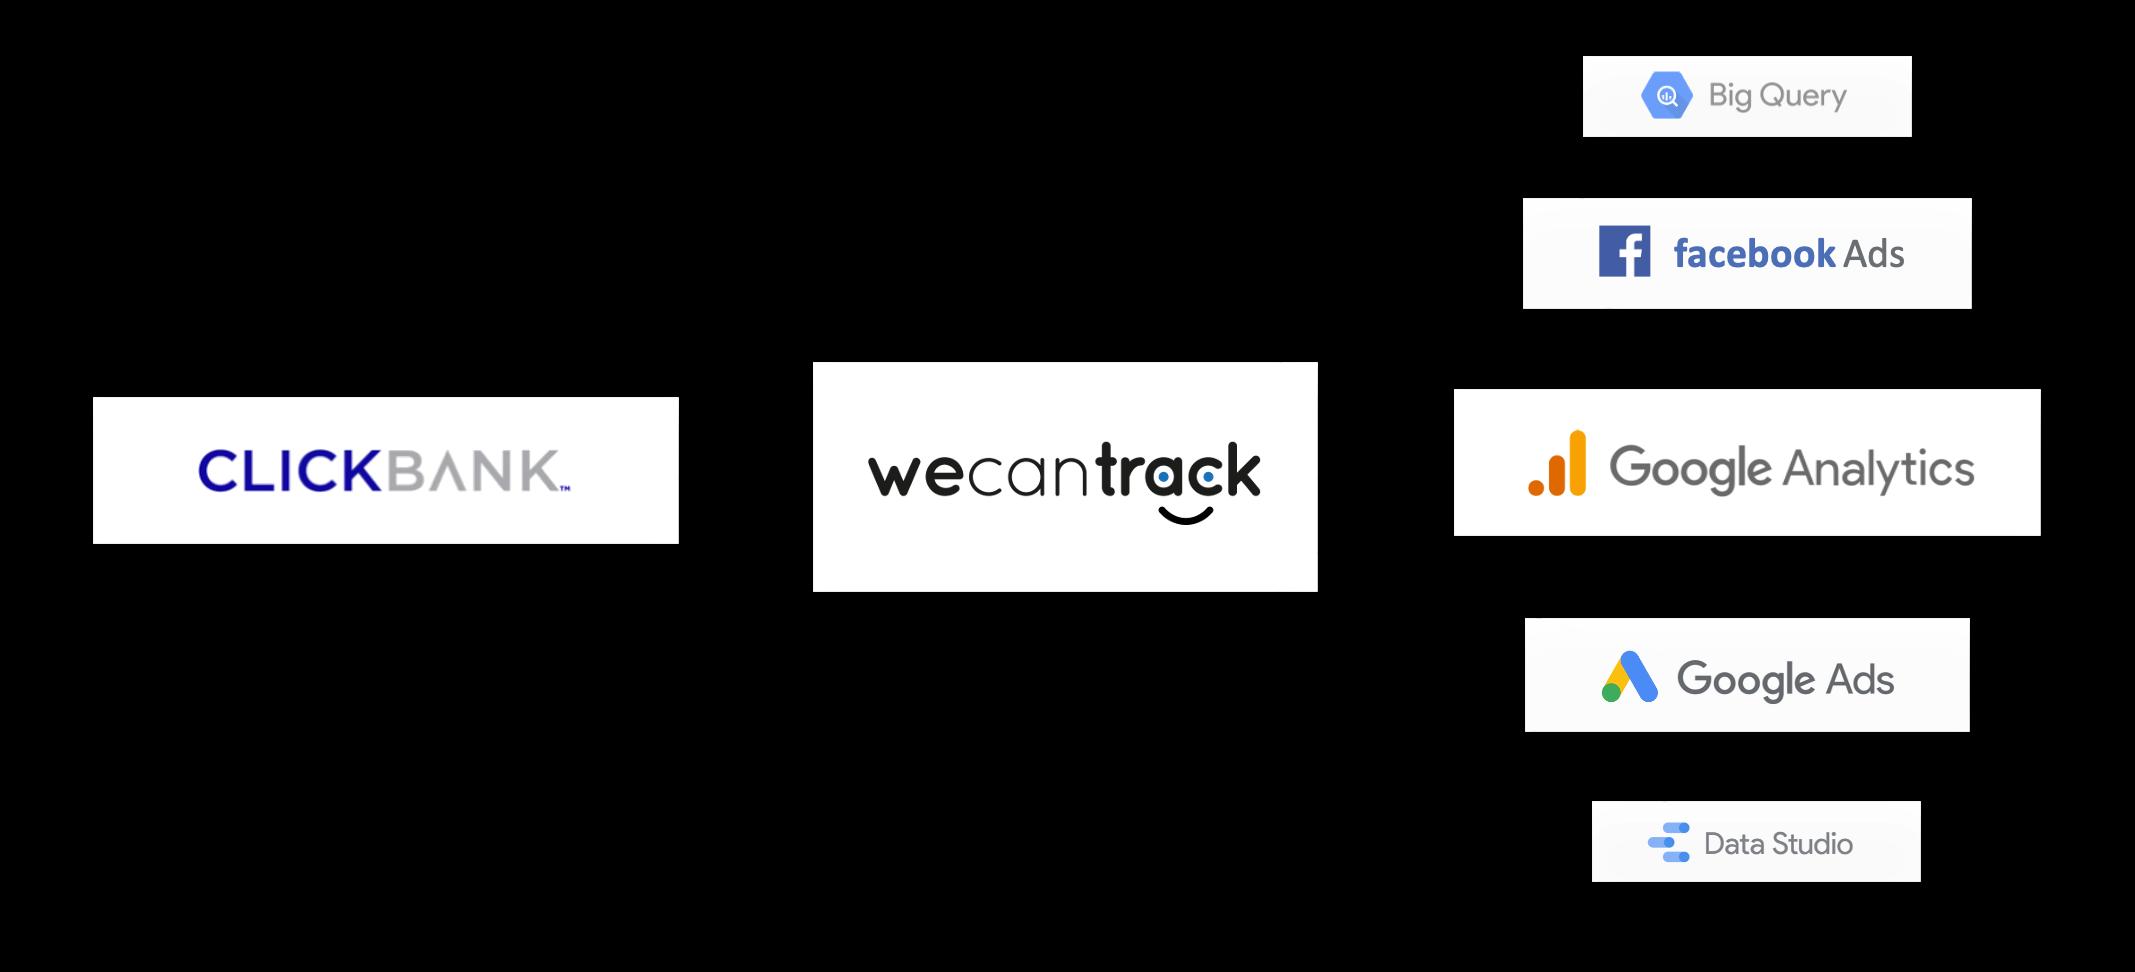 clickbank-affiliate-conversion-integration-via-api